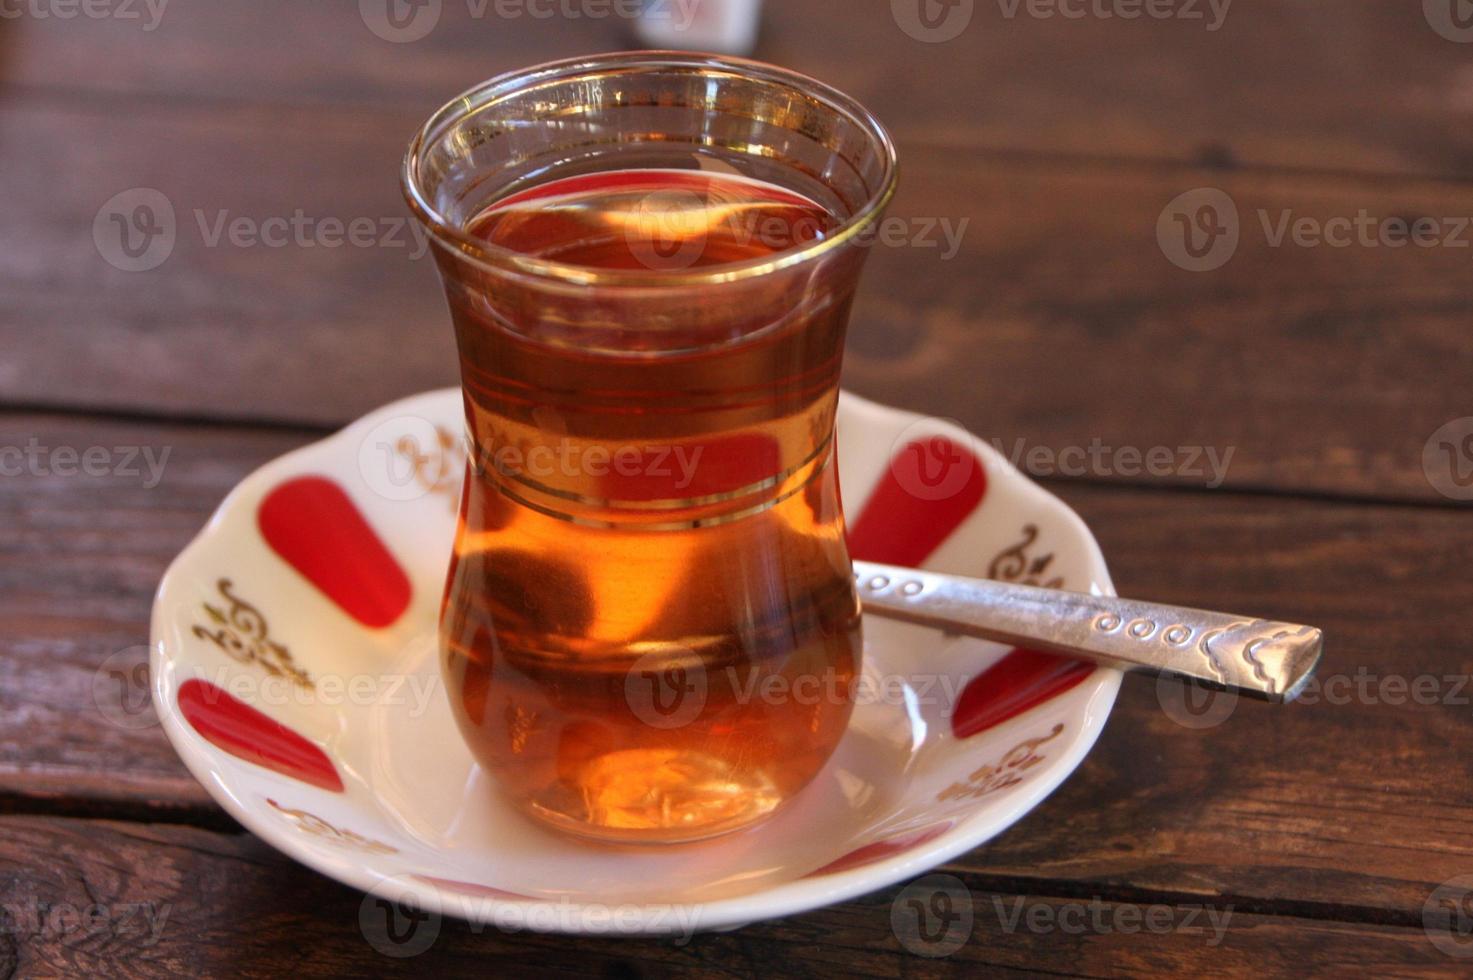 delikat glas turkiskt te foto